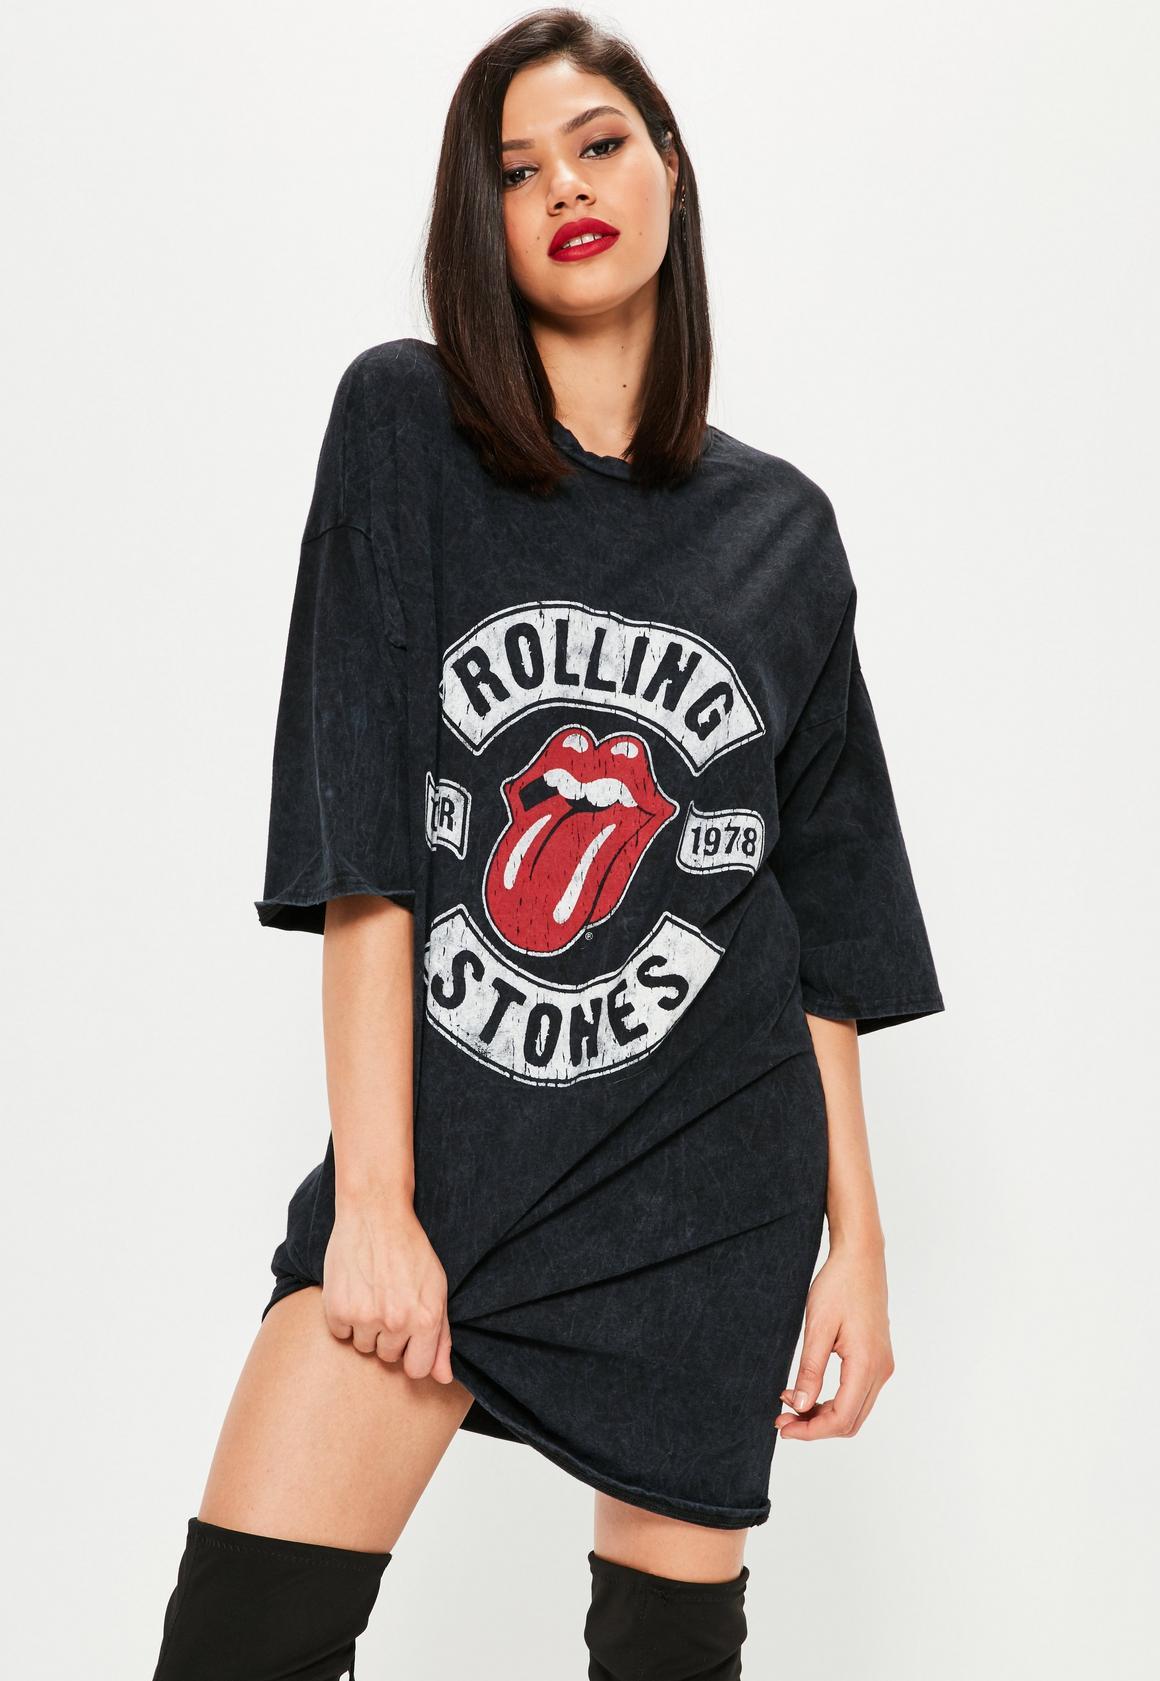 White t shirt dress outfit - Black Rolling Stones Rock T Shirt Dress